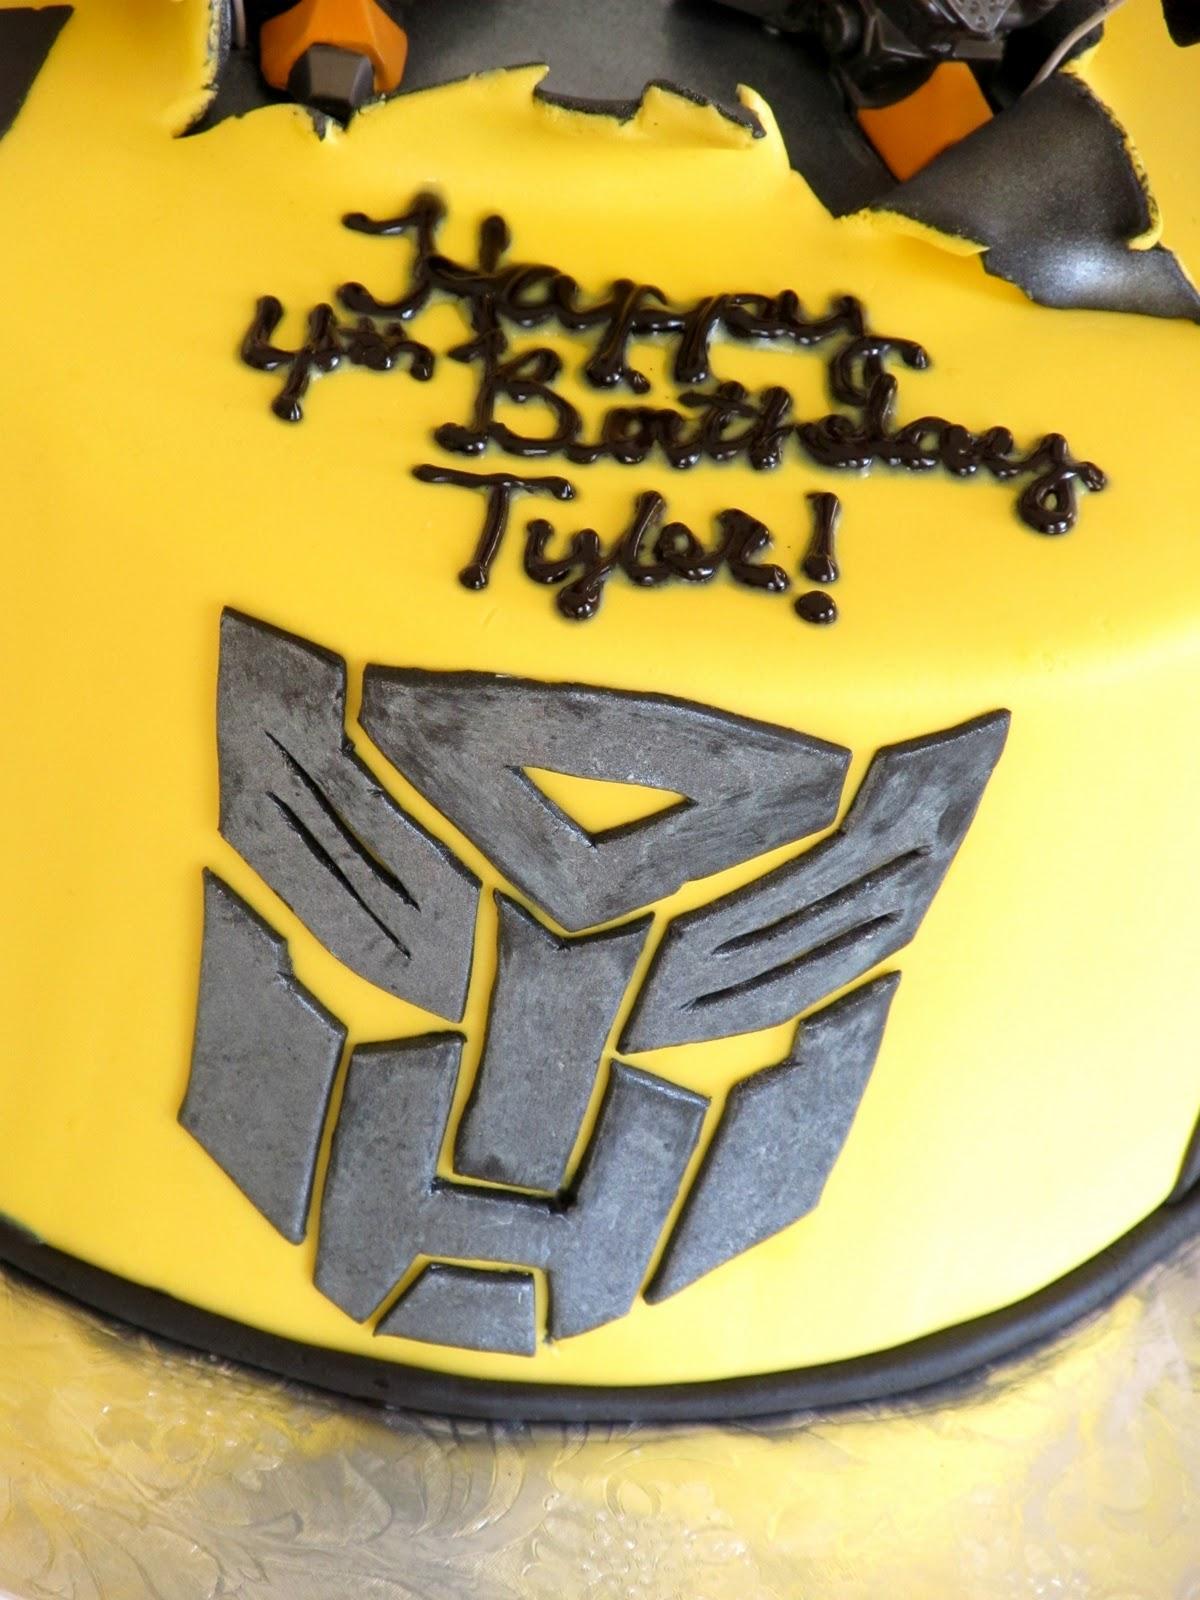 Transformers Bumblebee Cake Renee Conner Cake Design